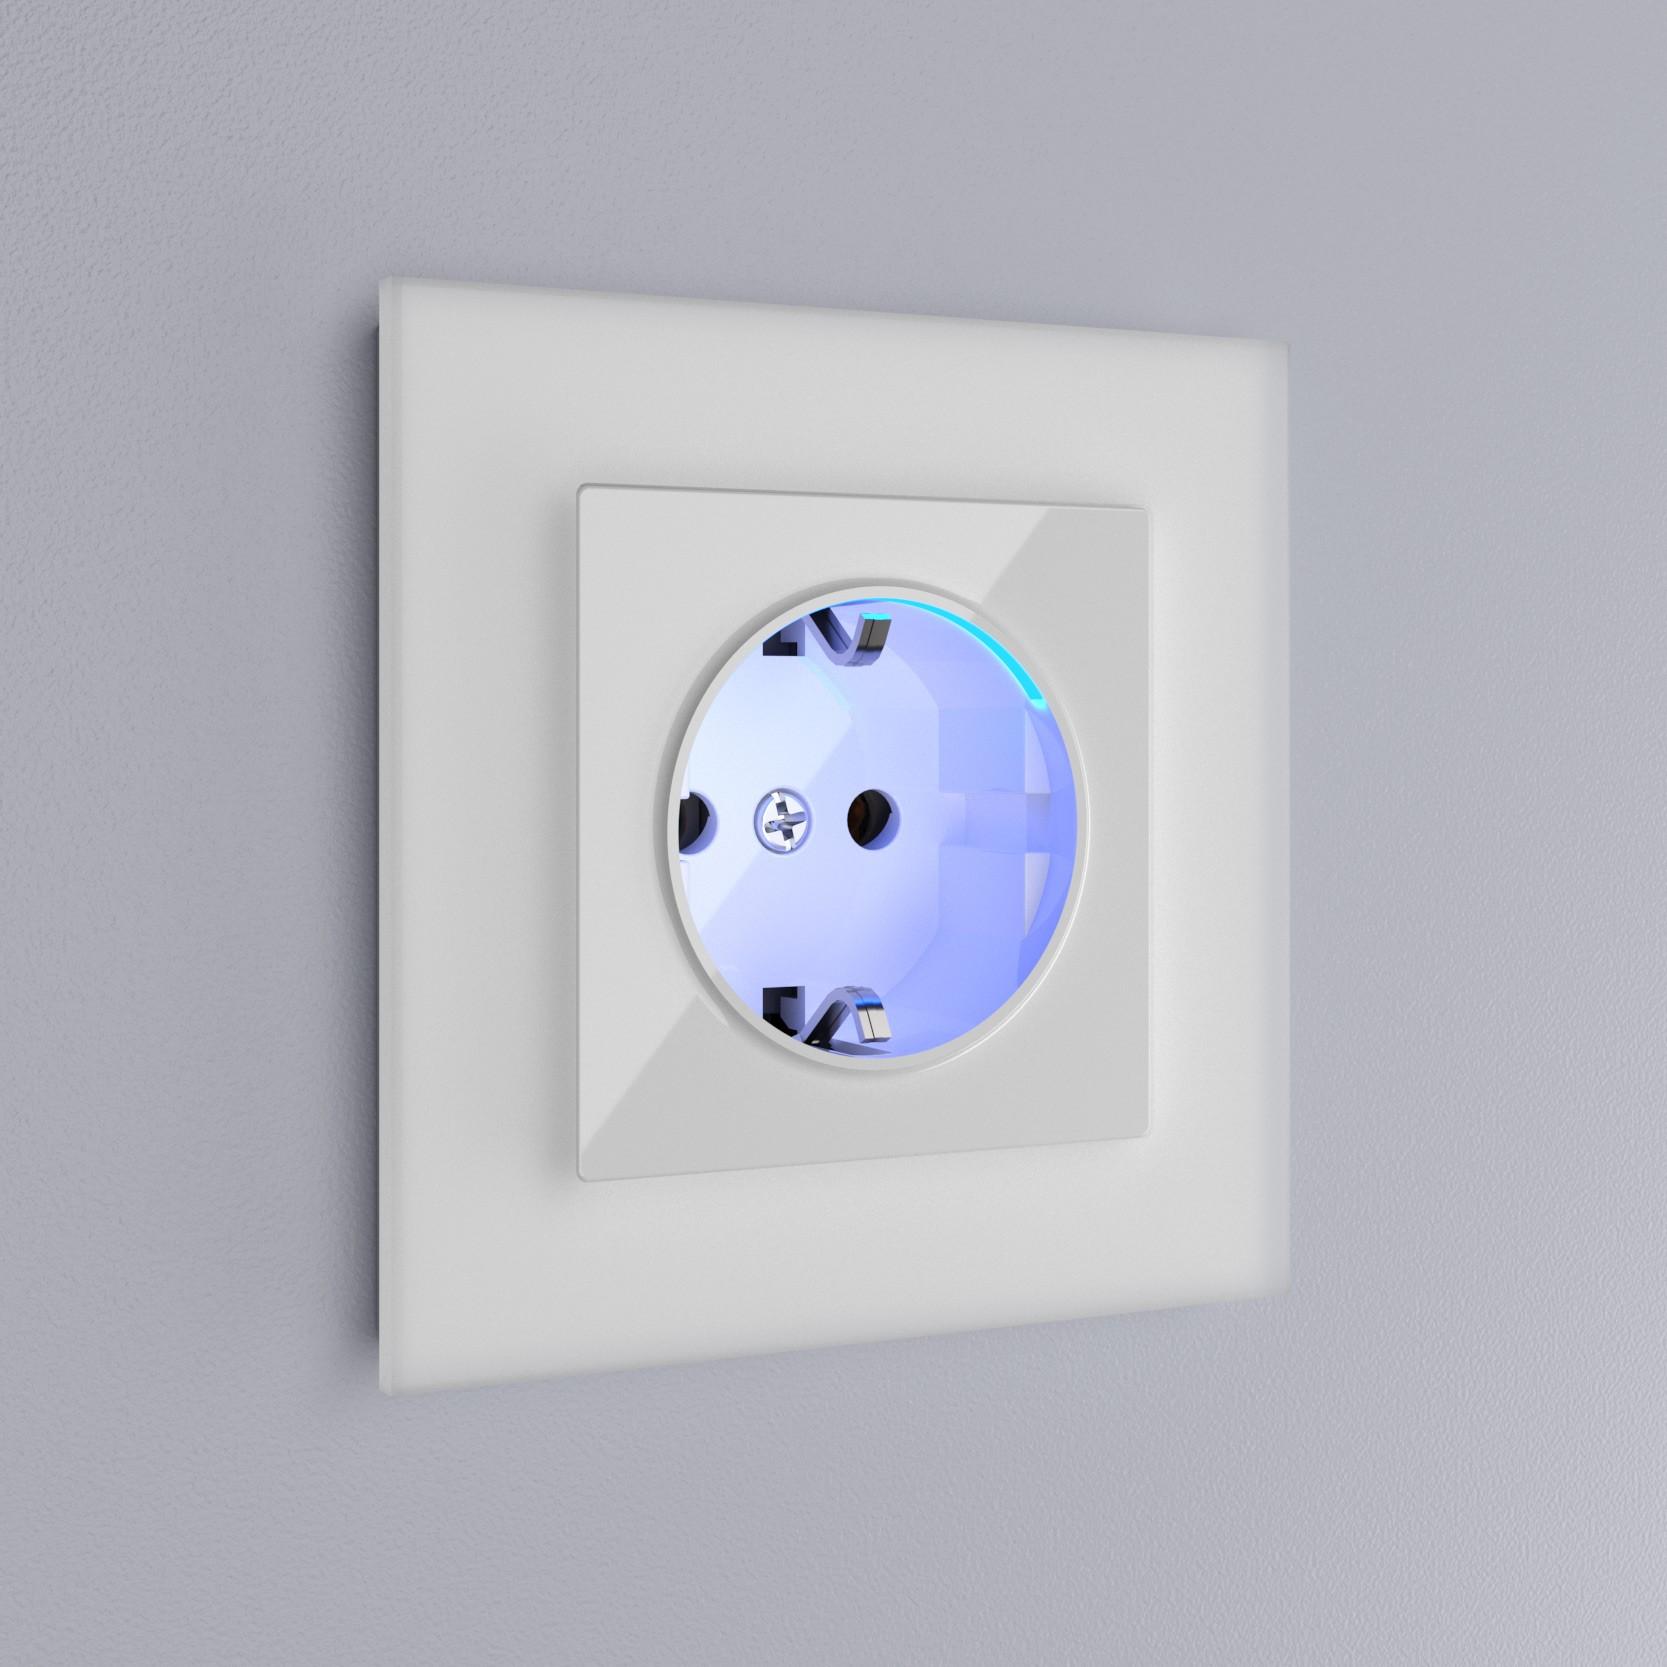 WL01-Frame-01 / Рамка на 1 пост (белый матовый,стекло)